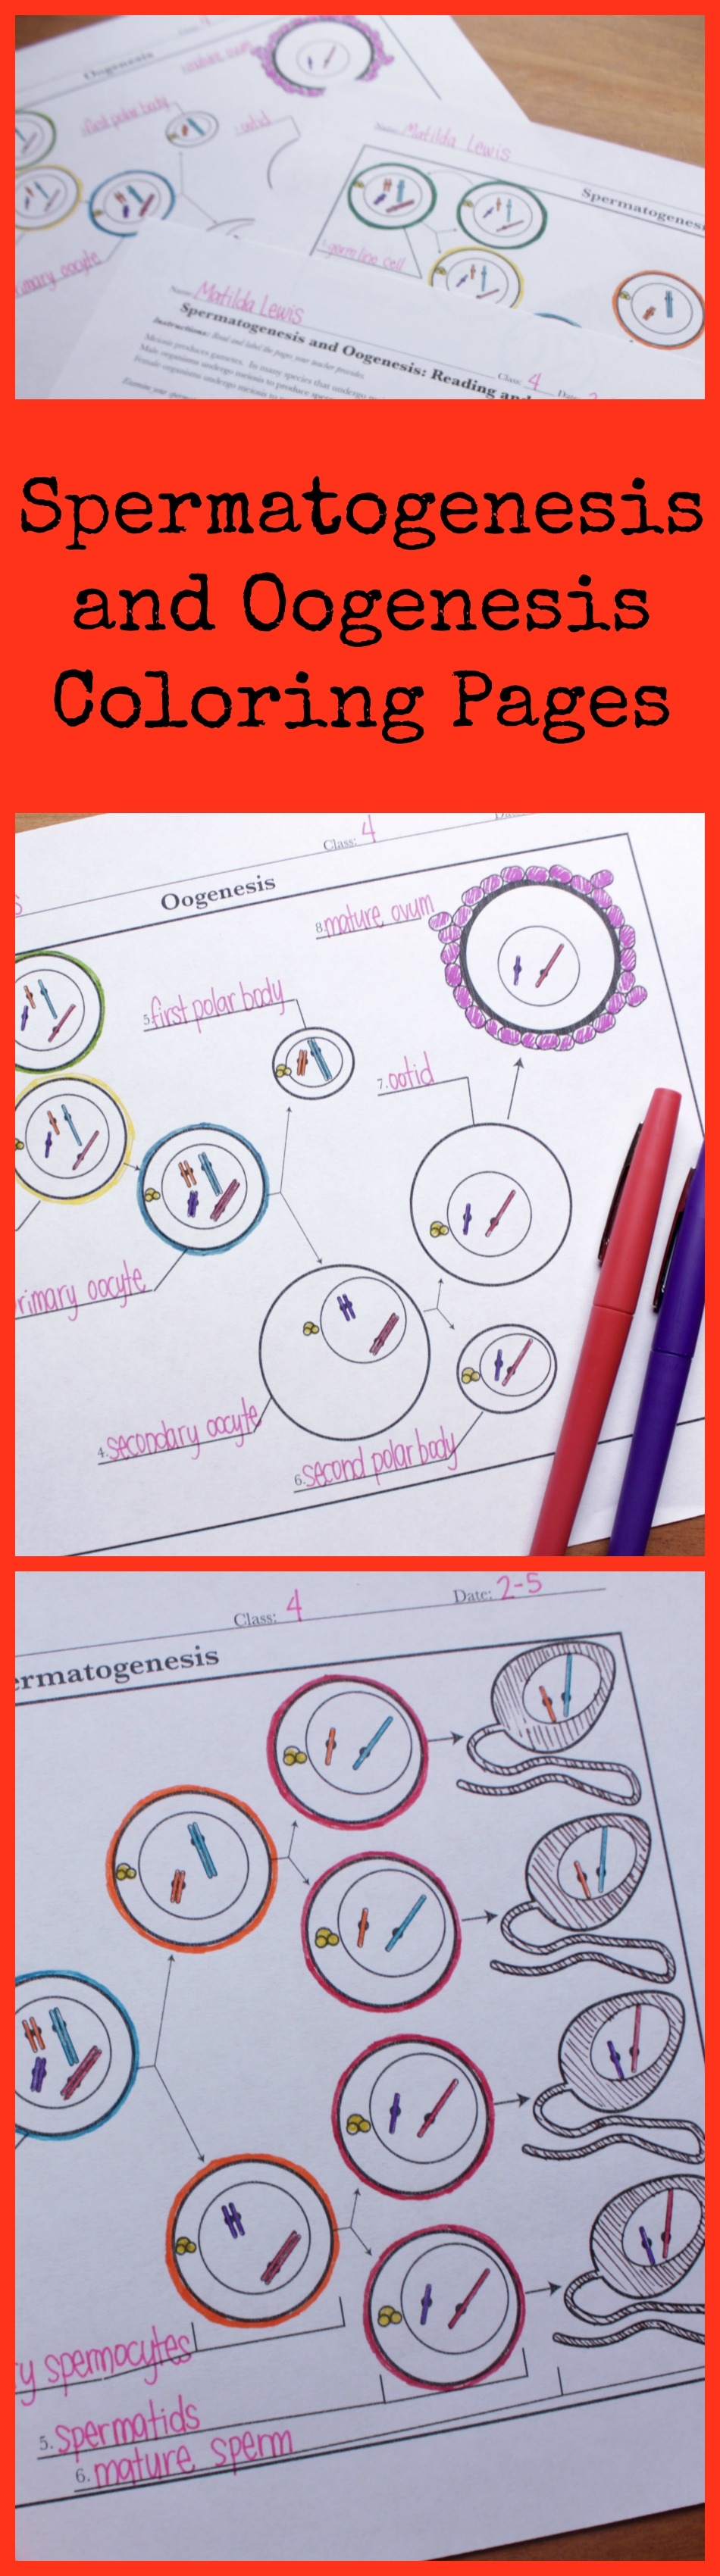 spermatogenesis and oogenesis diagram activities high